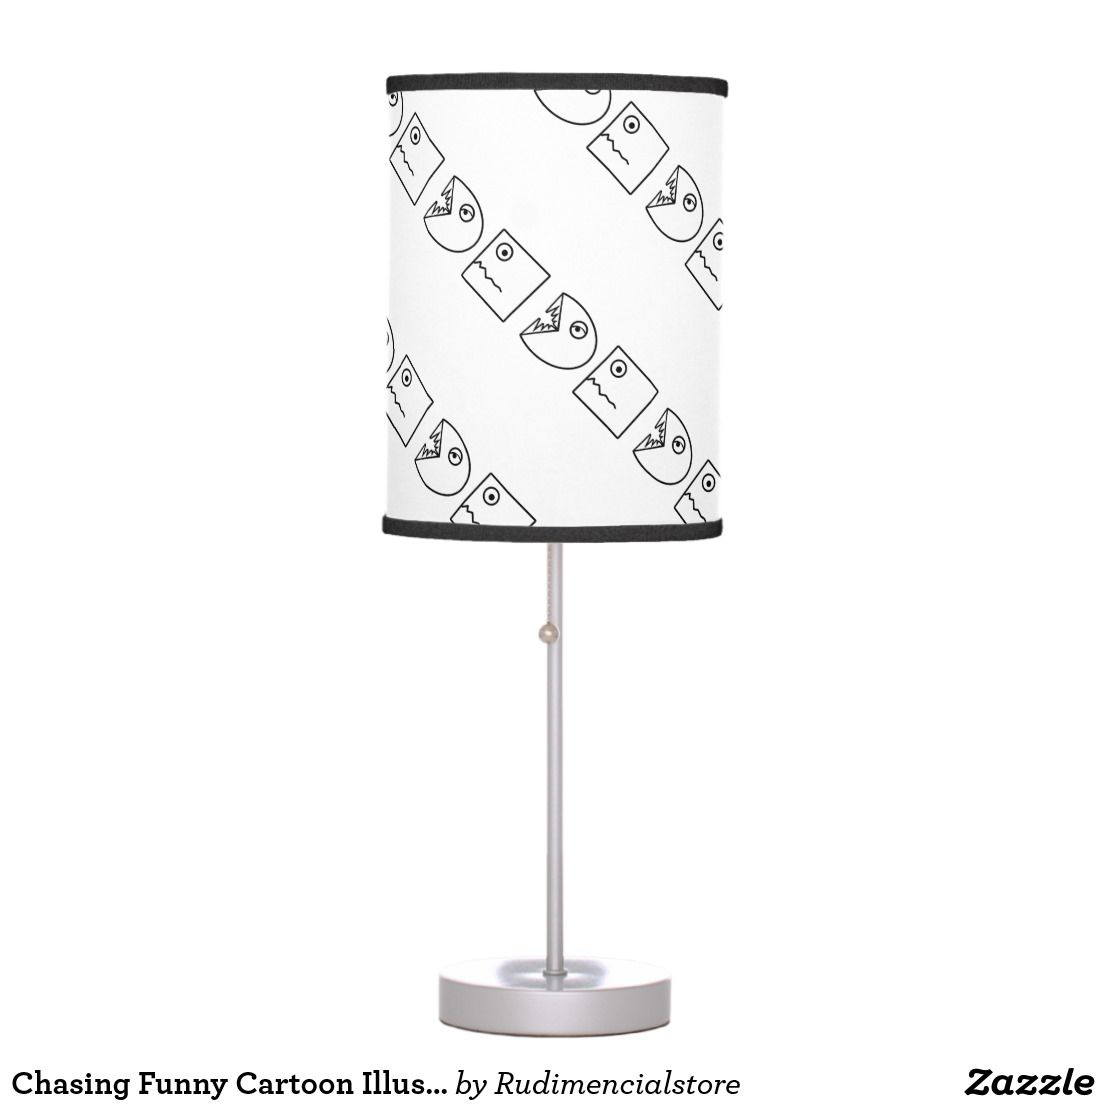 Chasing Funny Cartoon Illustration Table Lamp Zazzle Com Lamp Cartoon Illustration Desk Lamp